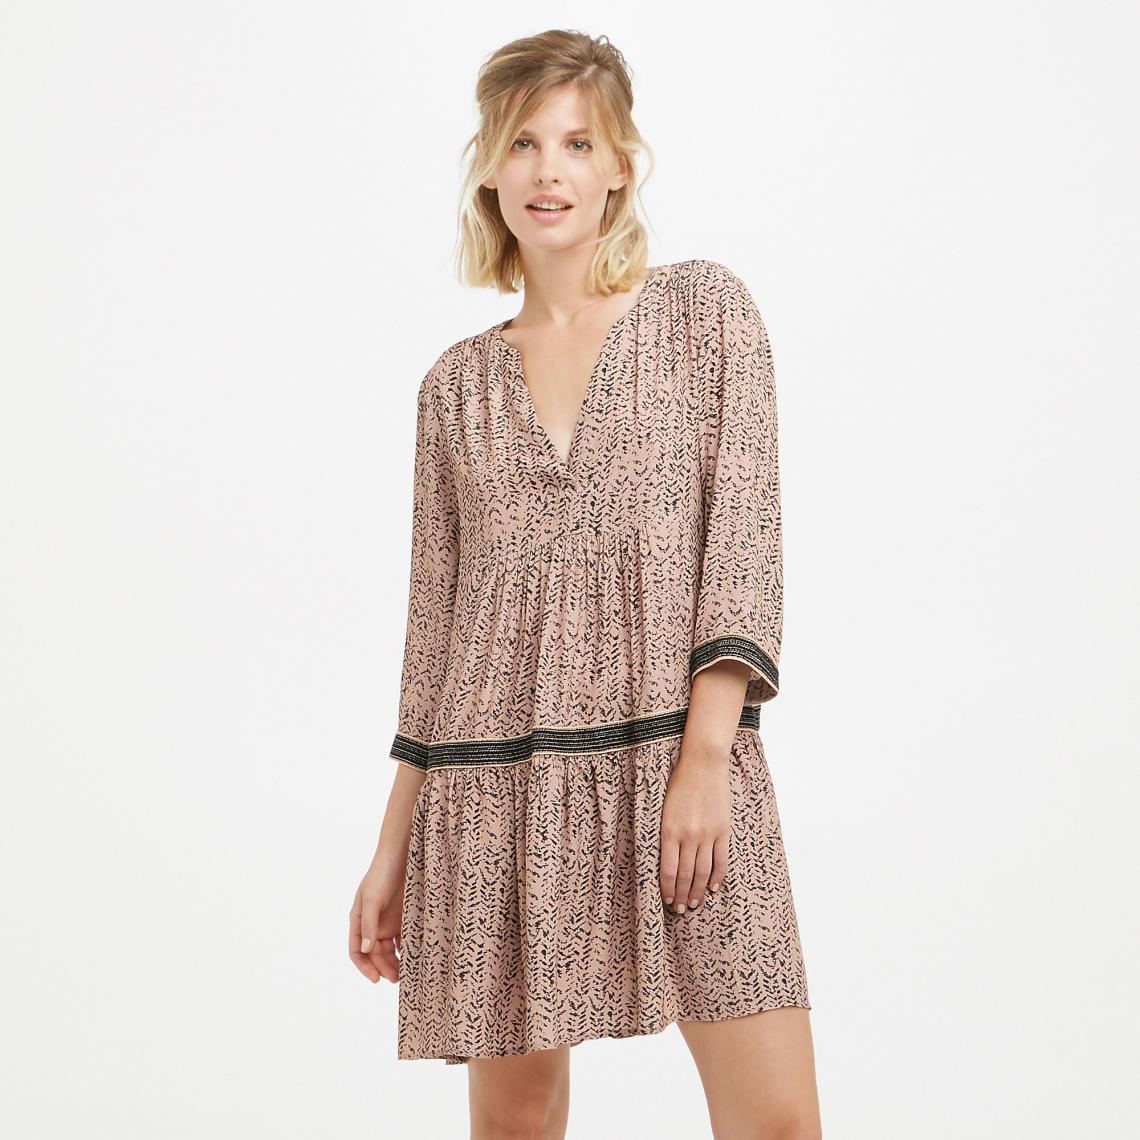 3a2e597f7c6 Robe courte imprimée ample femme See U Soon - Rose See u Soon Femme